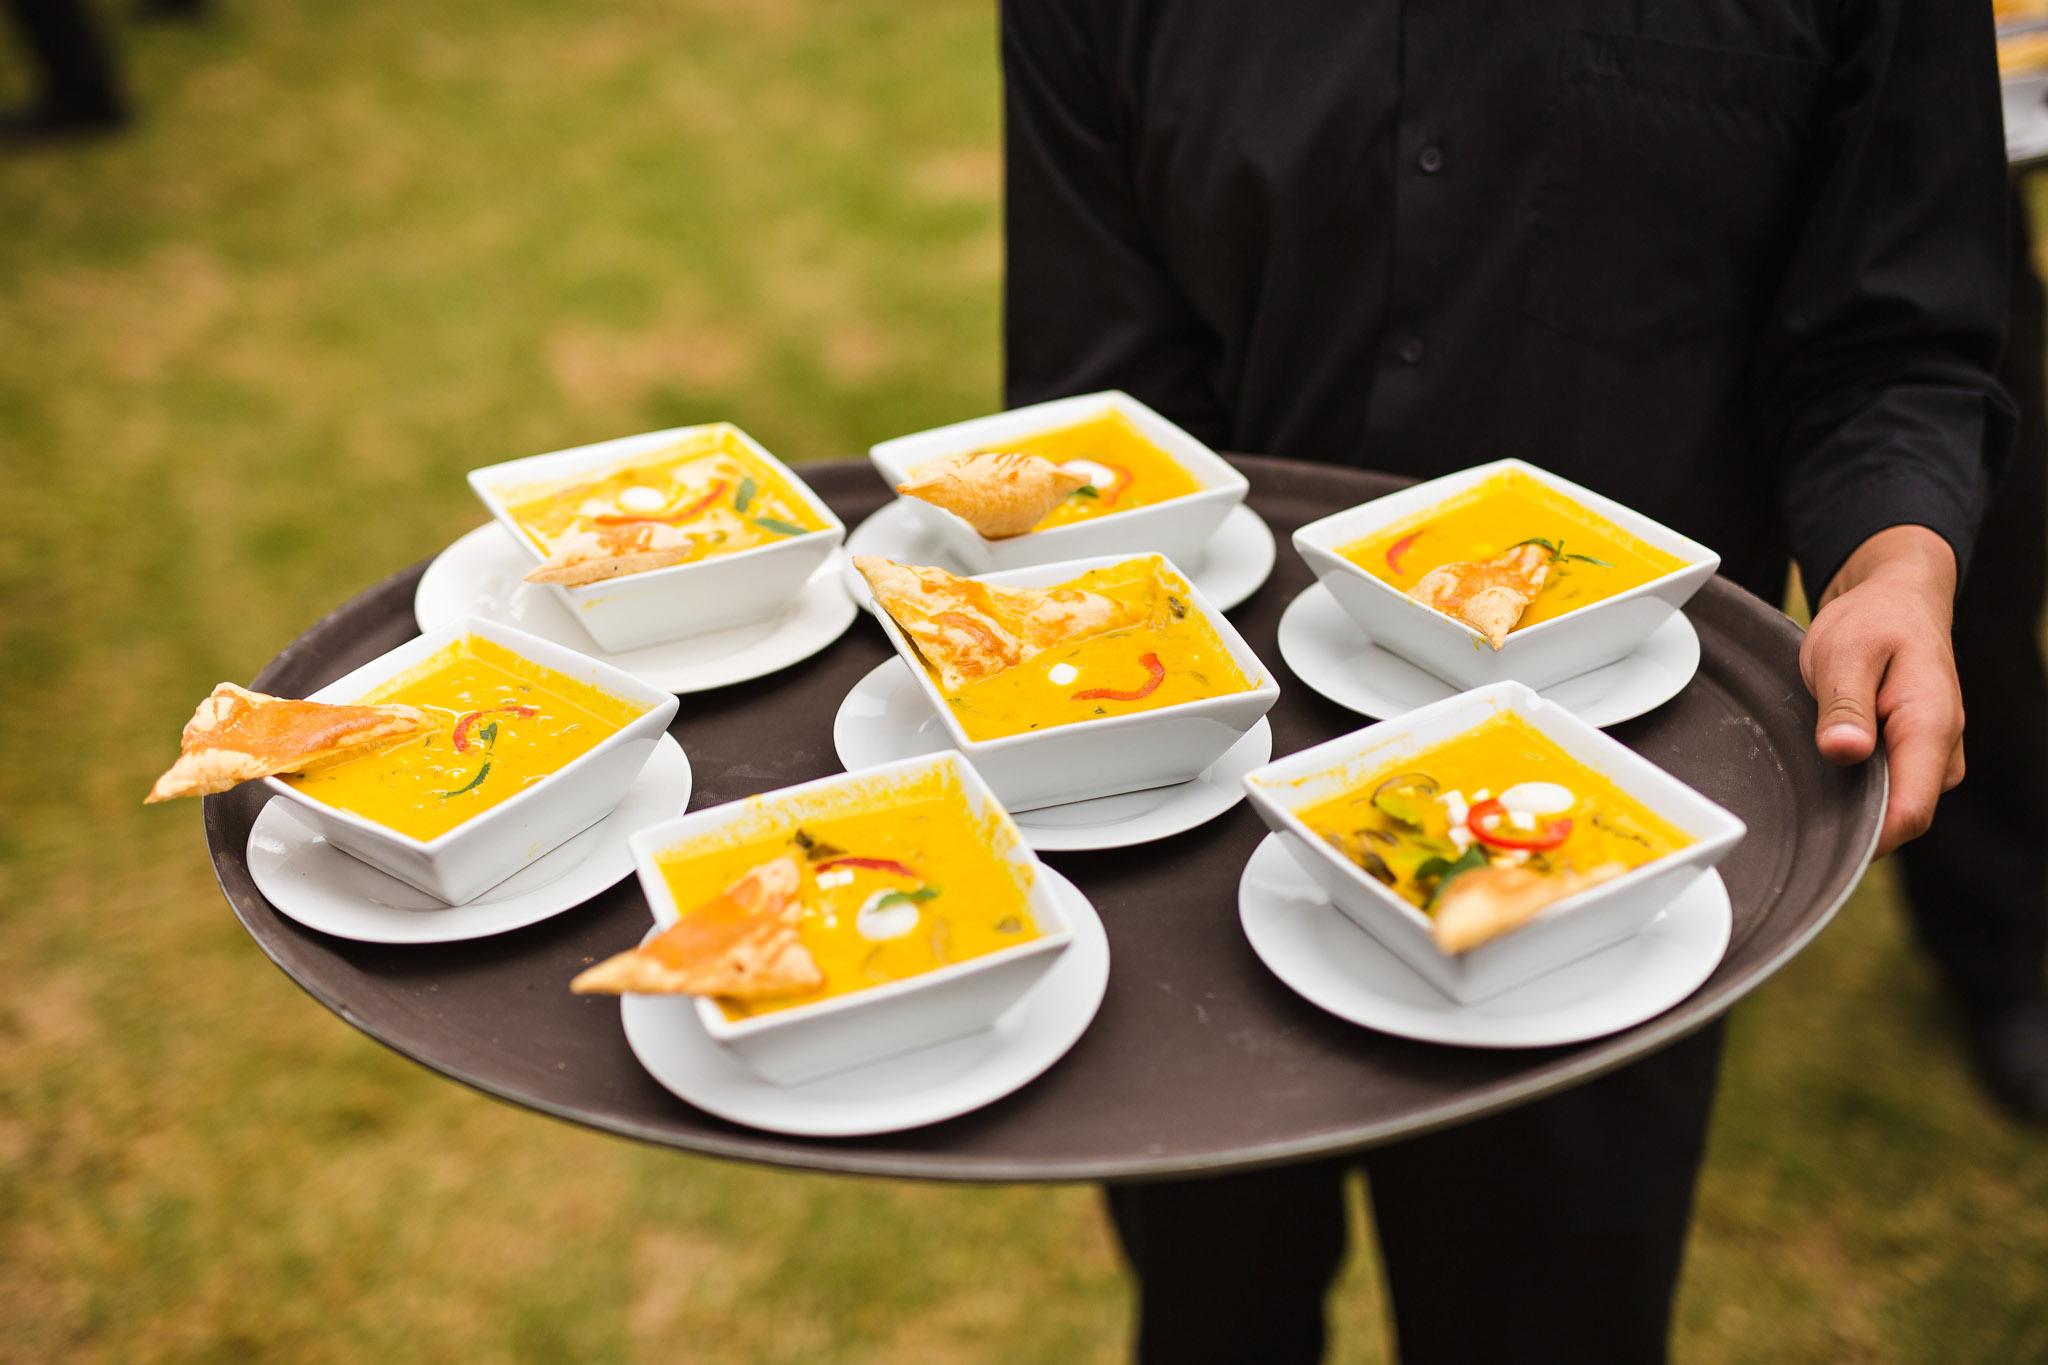 Wedding-Travellers-Destination-Wedding-Peru-Cusco-Hacienda-Sarapampa-Sacred-Valley-food-dinner